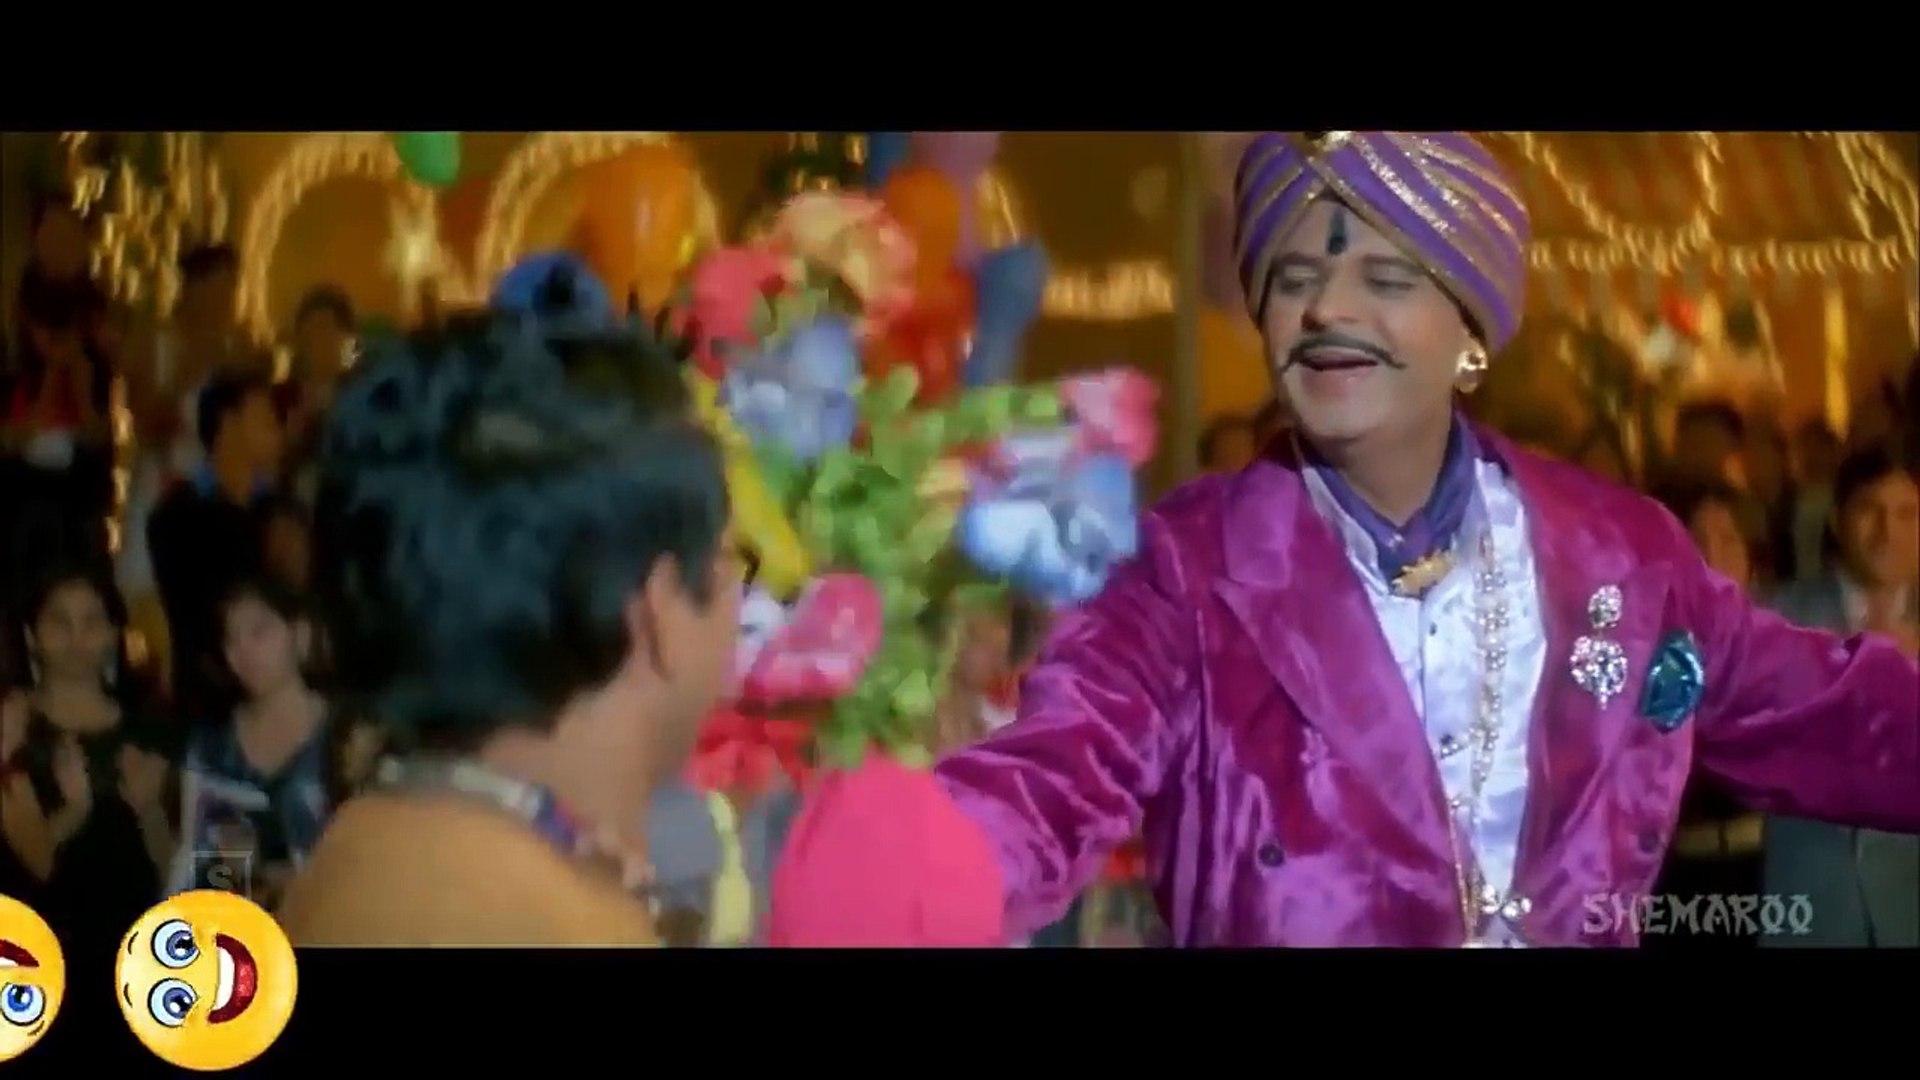 Rajpal yadav comedy scenes - mujhse shaadi karogi comedy - Dhol comedy - sunny comedy